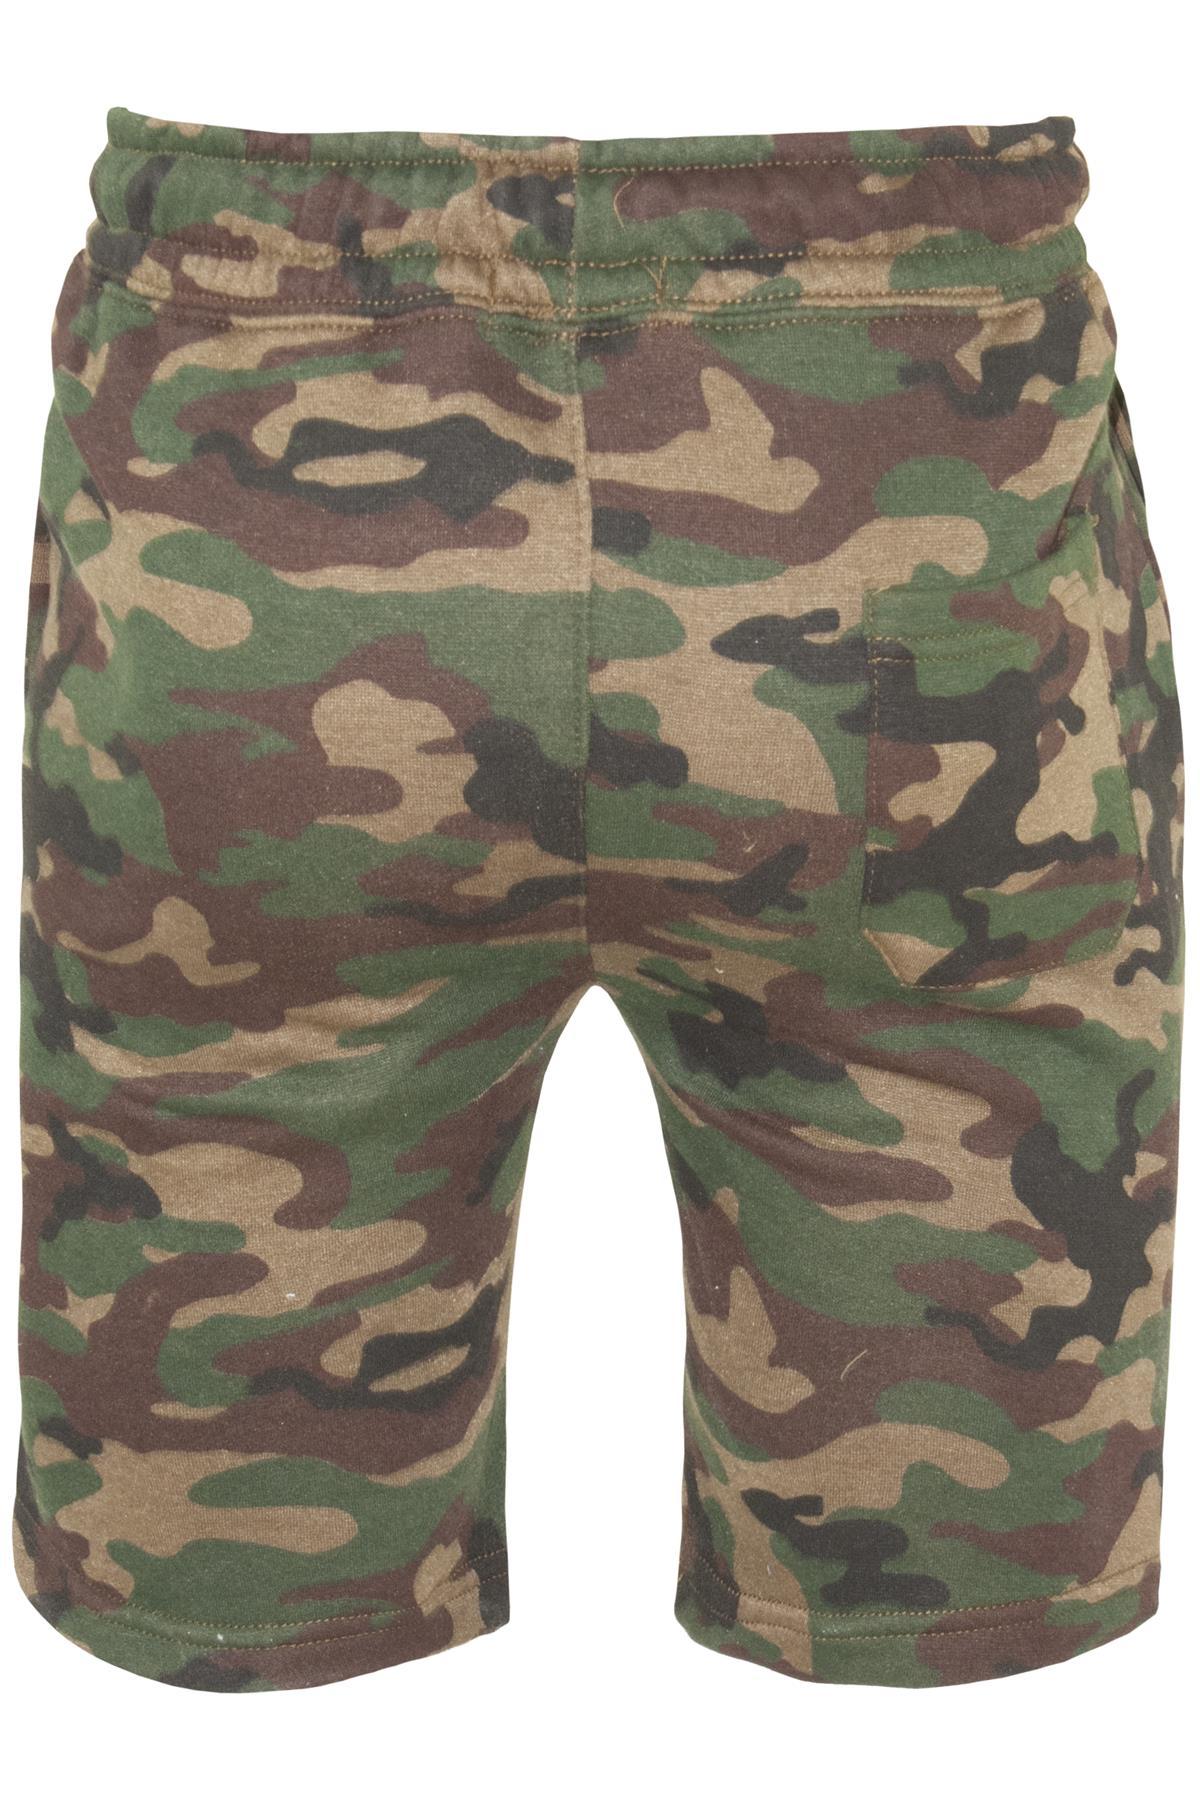 Mens-Contrast-Panel-Running-Summer-Side-Slit-Knee-Length-Fleece-Bottoms-Shorts thumbnail 58